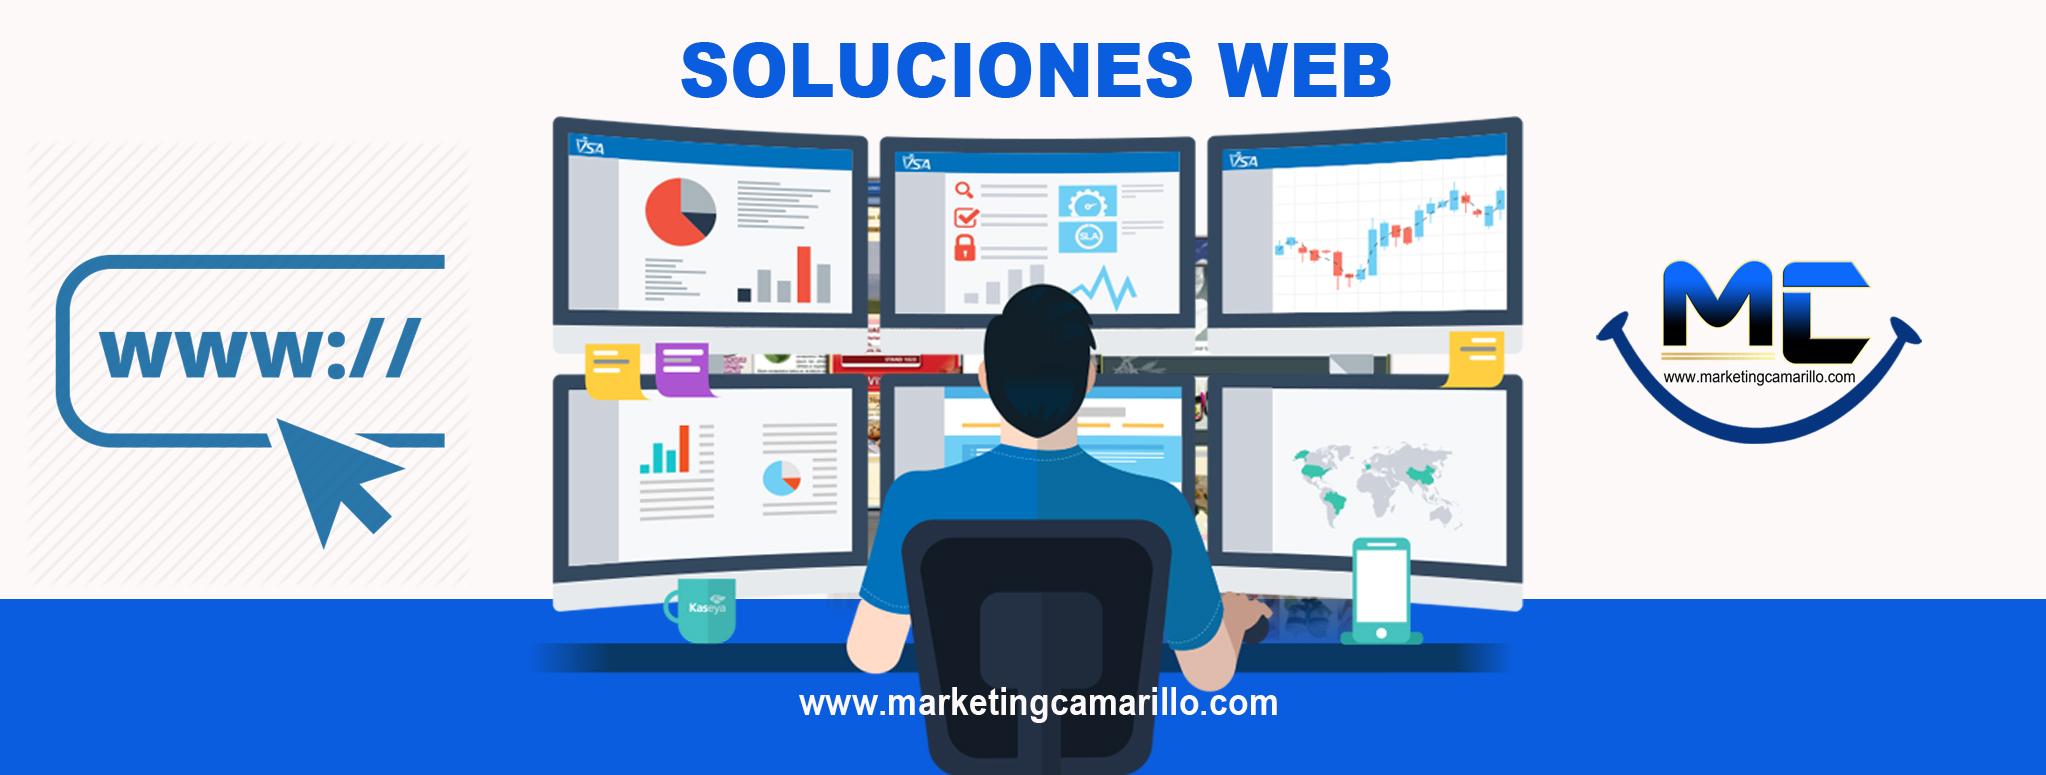 MARKETING CAMARILLO SOLUCIONES WEB